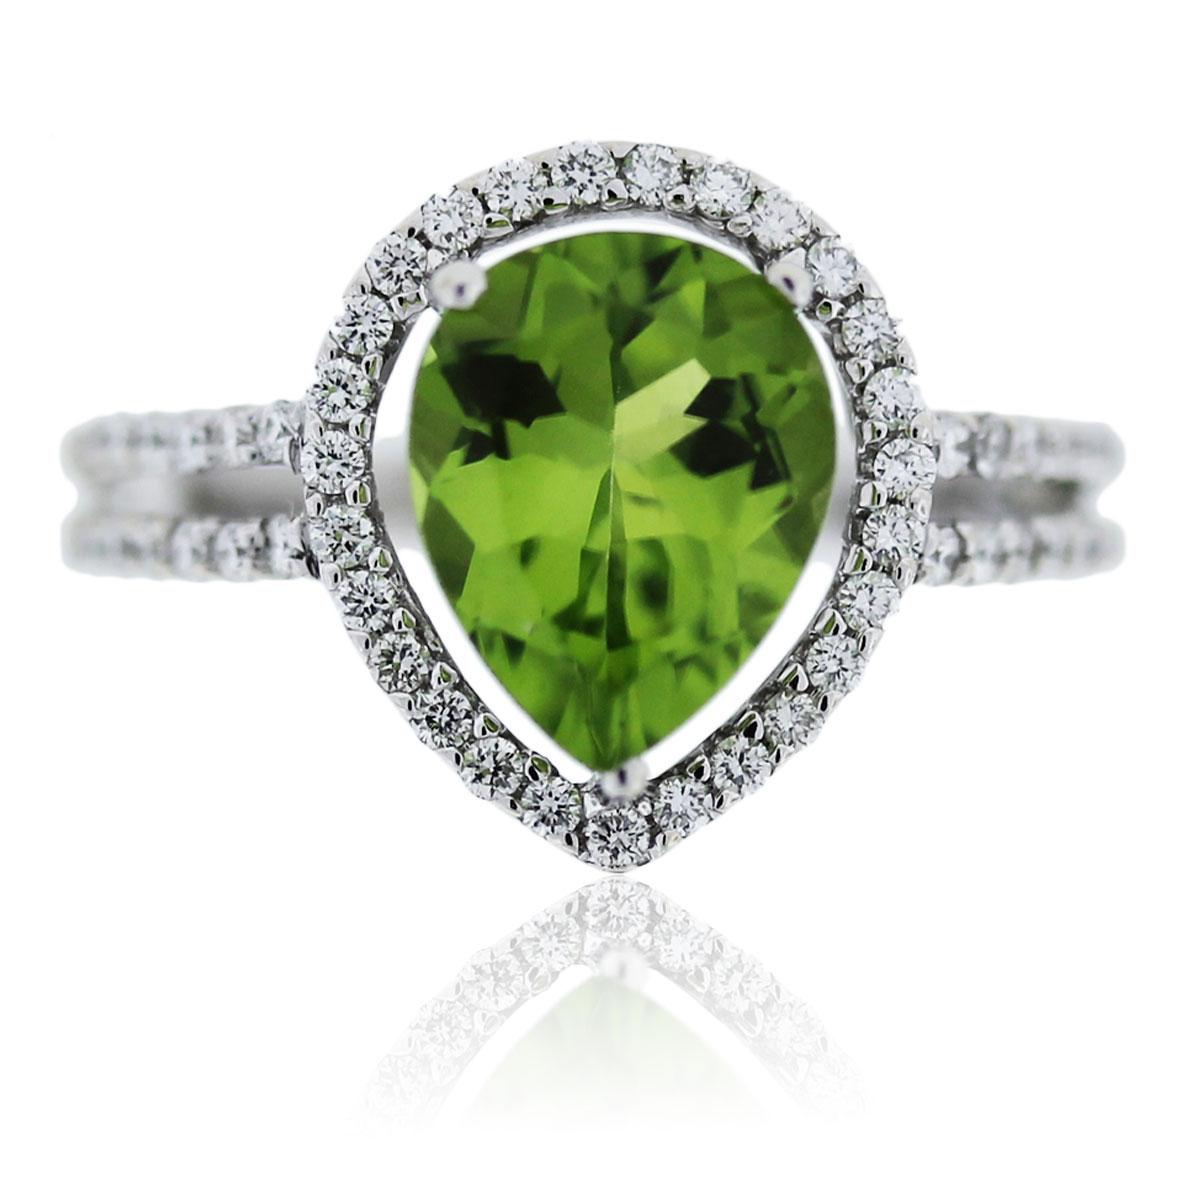 14K White Gold Diamond and Peridot Ring